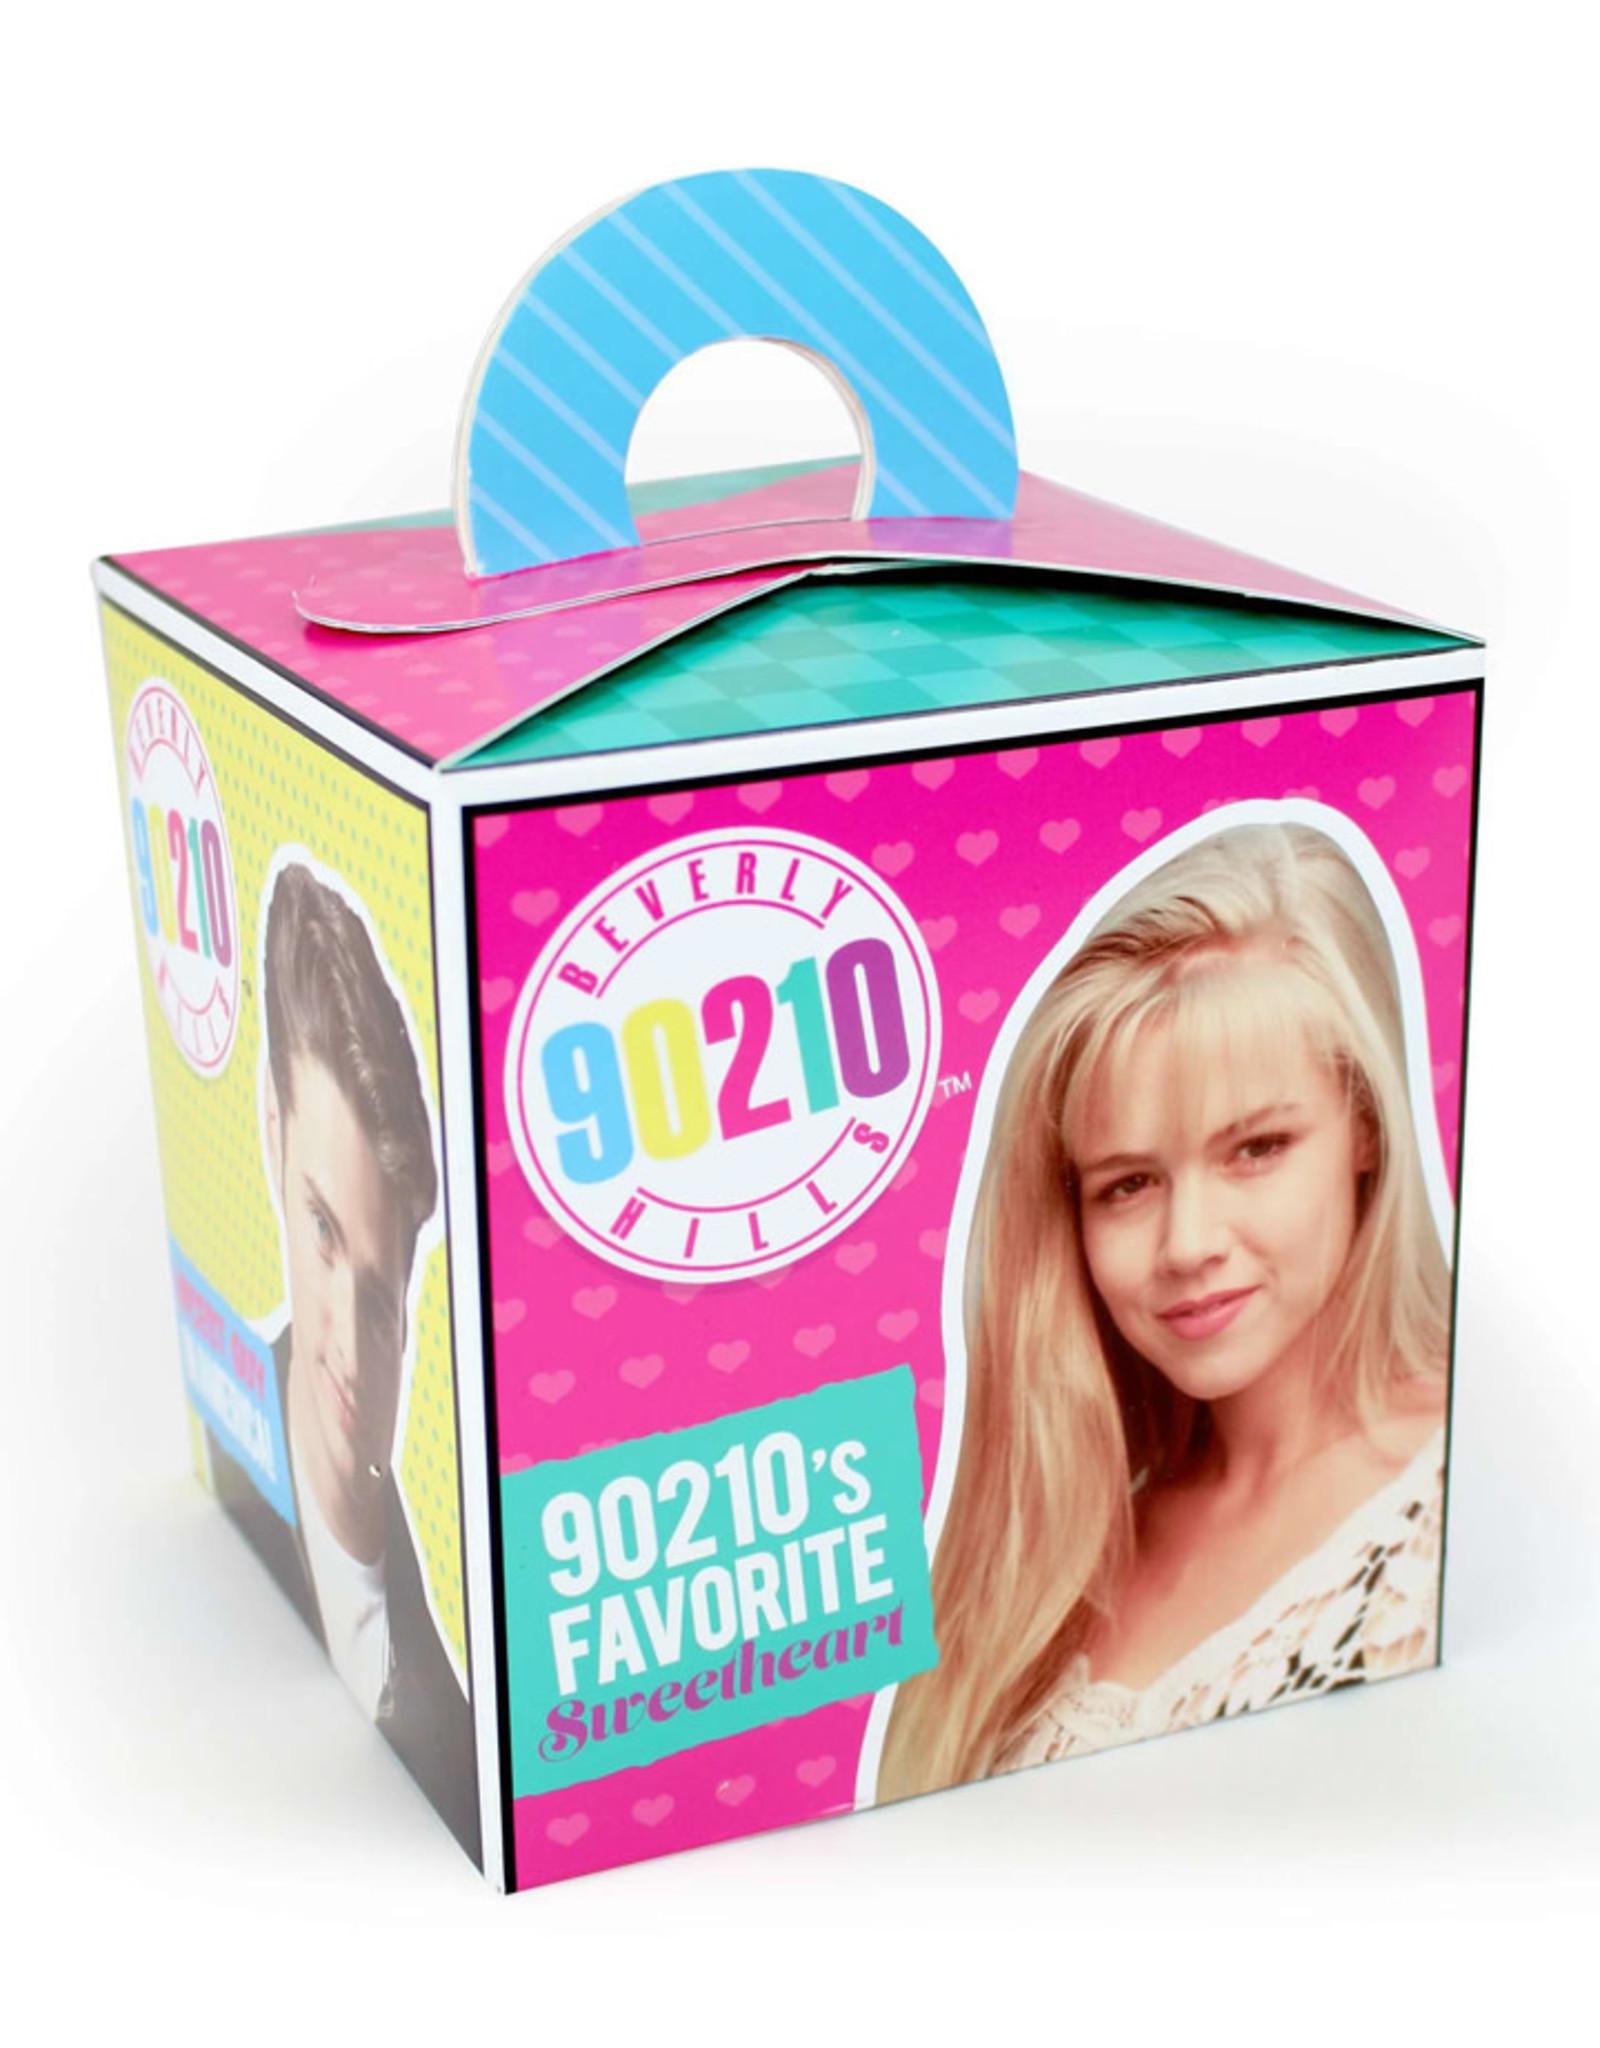 PRIME PARTY  90210 Favor Boxes (8 pack)